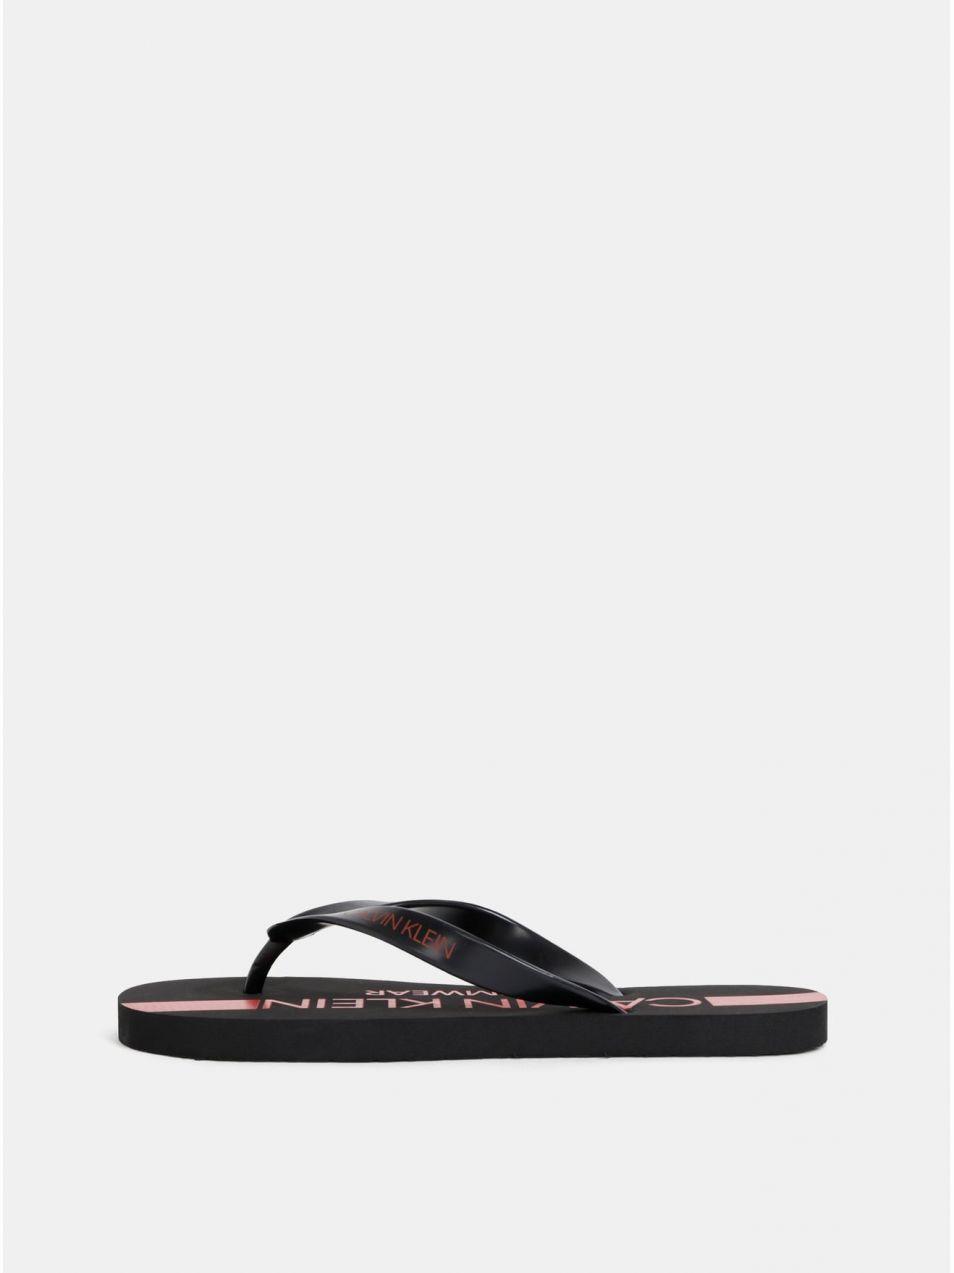 04d8a84c9aa37 Čierne pánske žabky s potlačou Calvin Klein Underwear značky Calvin ...